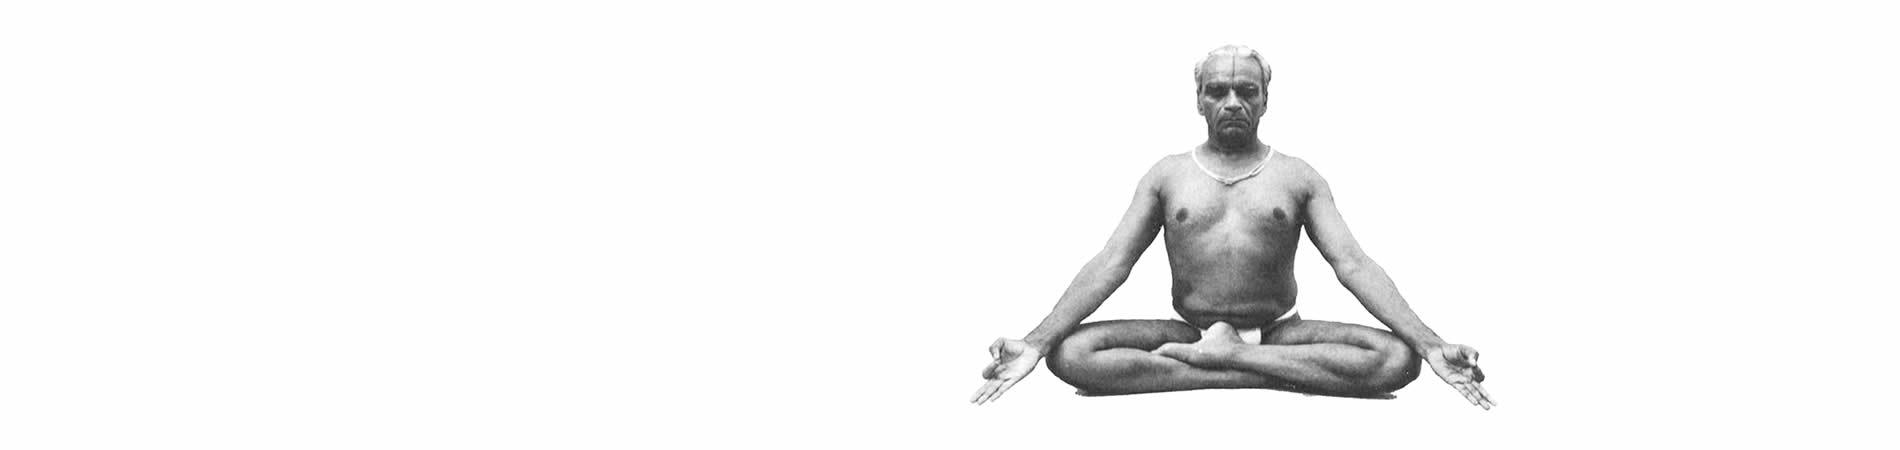 Iyengar yoga Instruction in Lytham St Annes